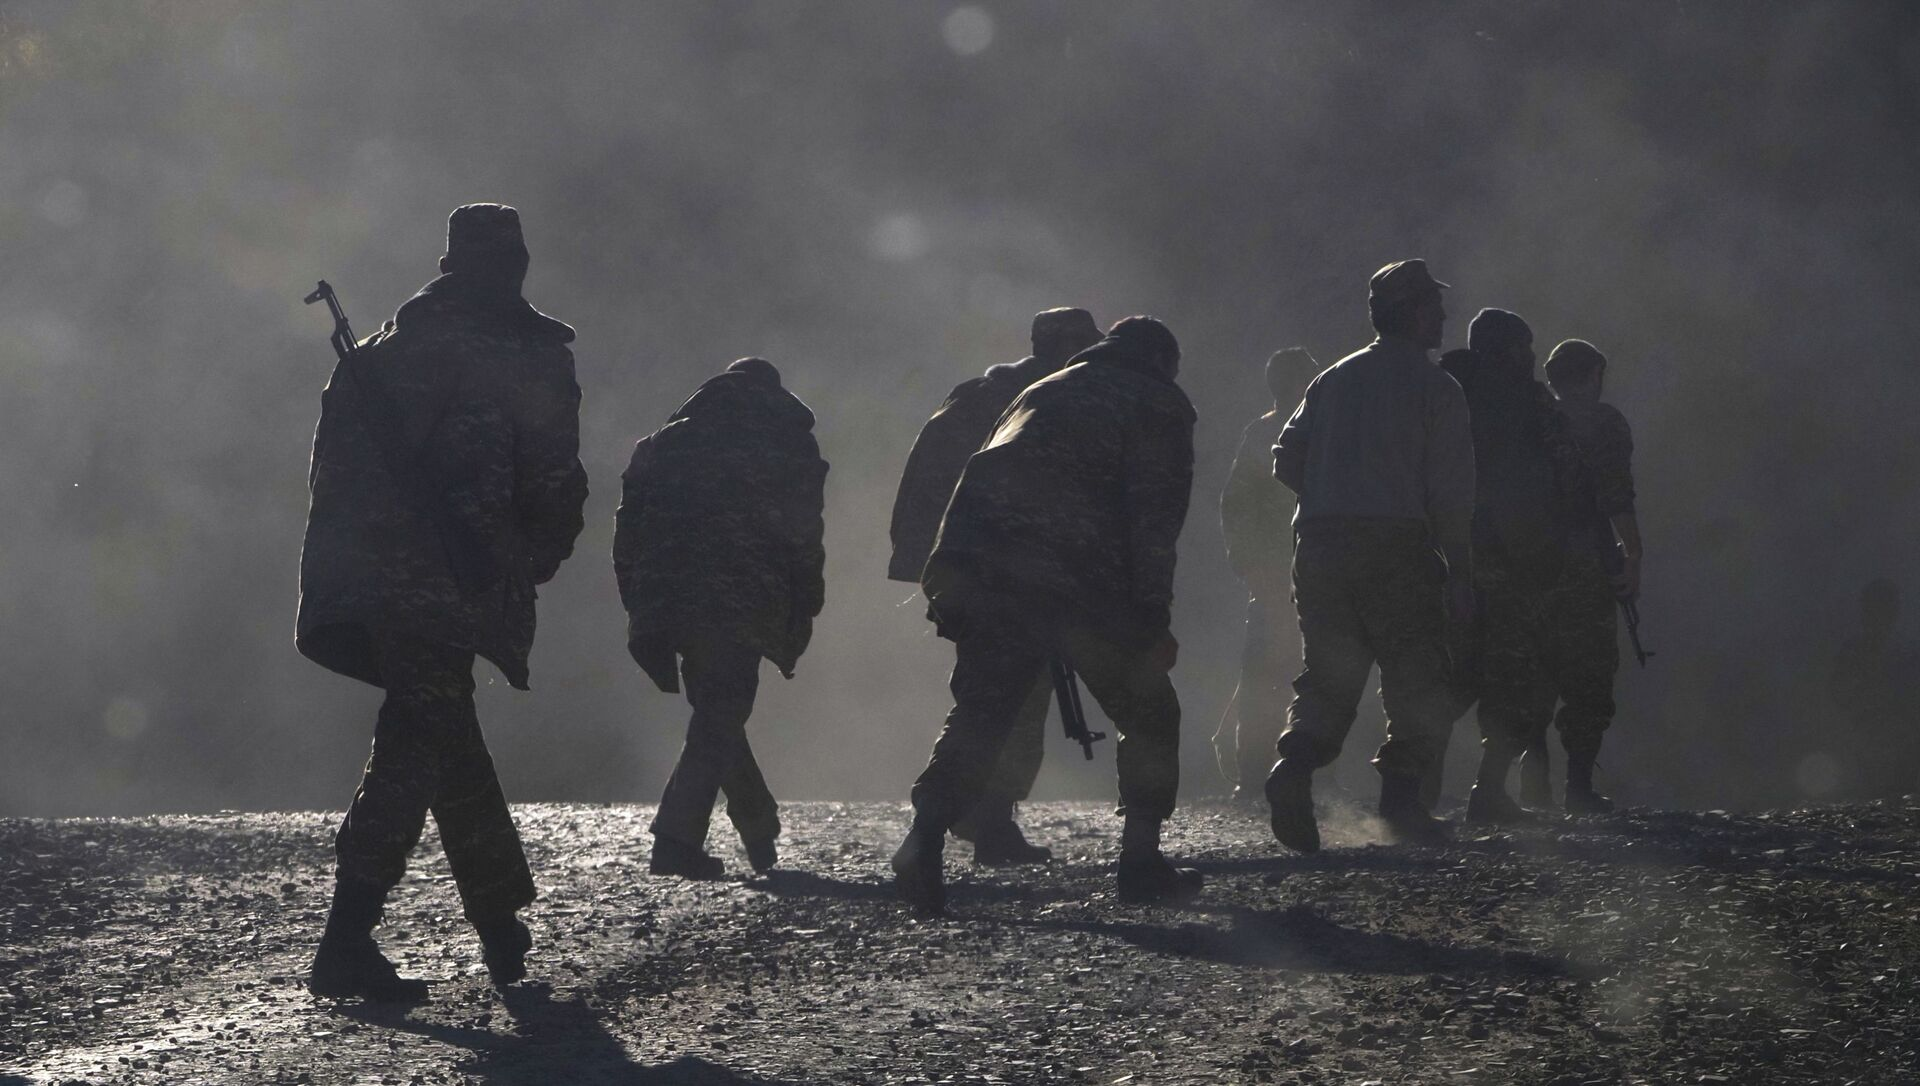 Ethnic Armenian soldiers walk along the road near the border between Nagorno-Karabakh and Armenia, Sunday, 8 November 2020. - Sputnik International, 1920, 28.07.2021